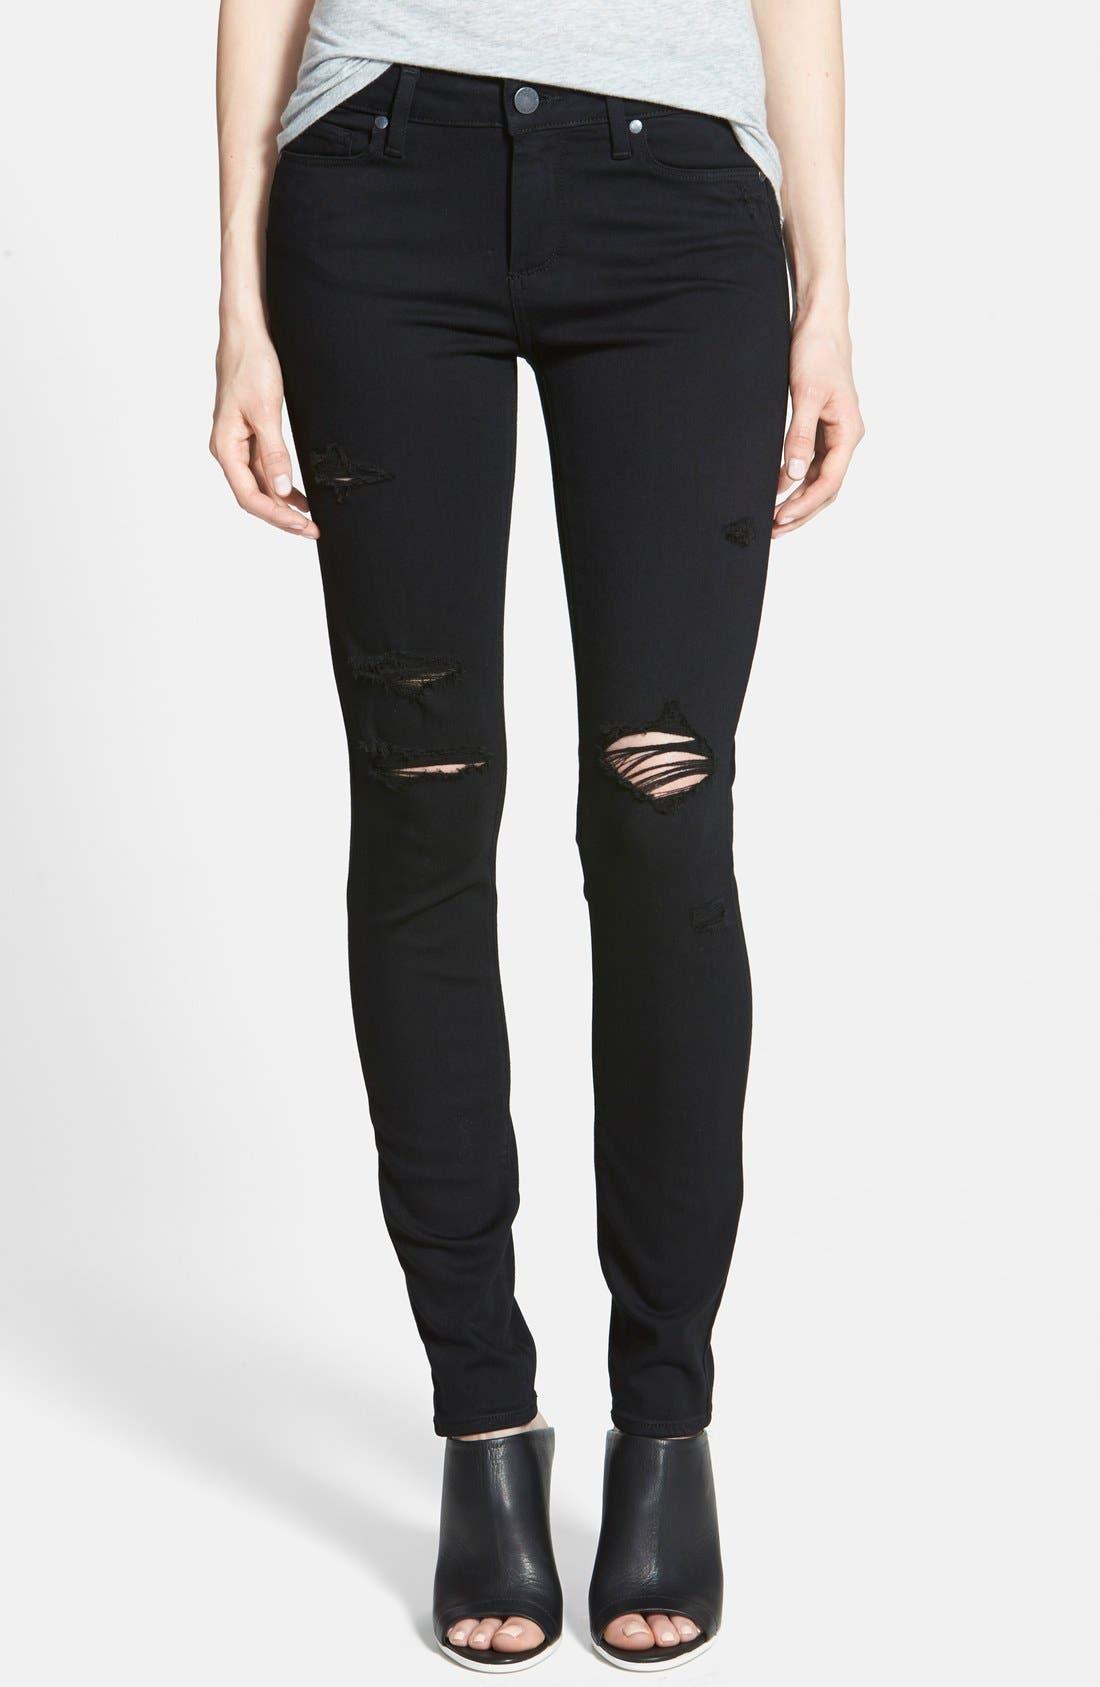 Alternate Image 1 Selected - PAIGE 'Transcend - Verdugo' Ultra Skinny Jeans